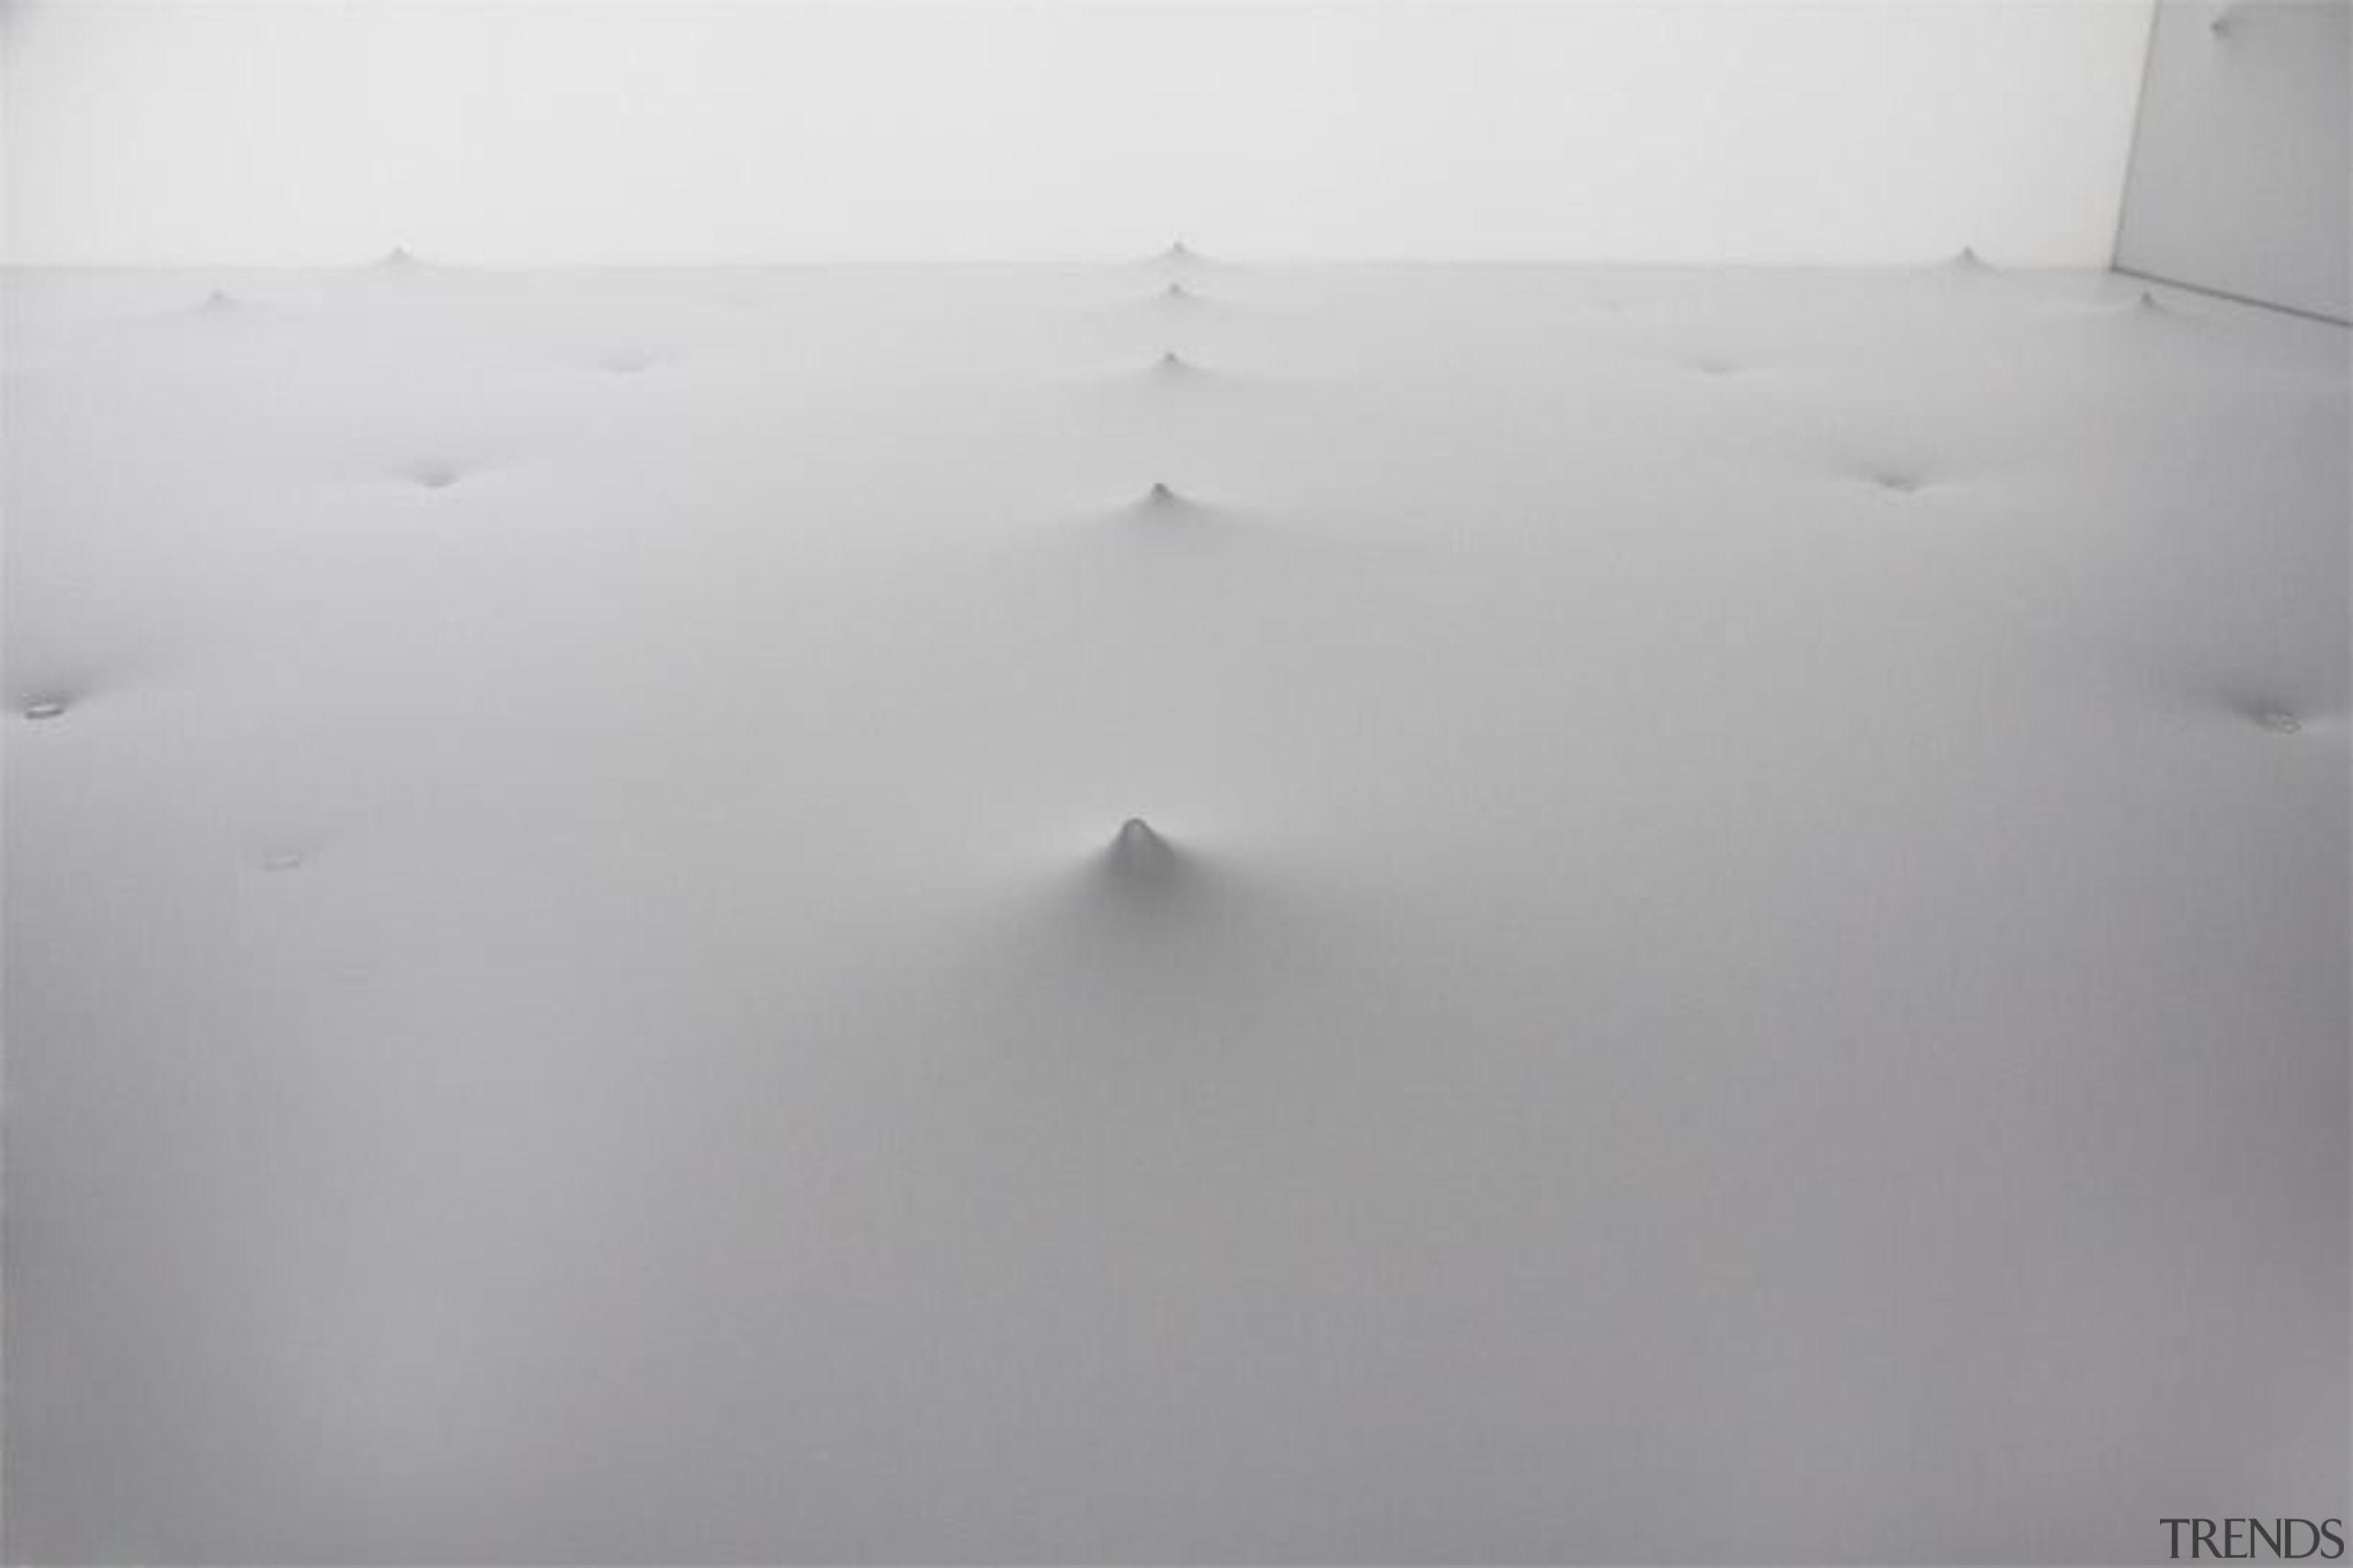 Lighting installation by Ross Lovegrove - Lighting installation fog, freezing, sky, snow, winter, gray, white